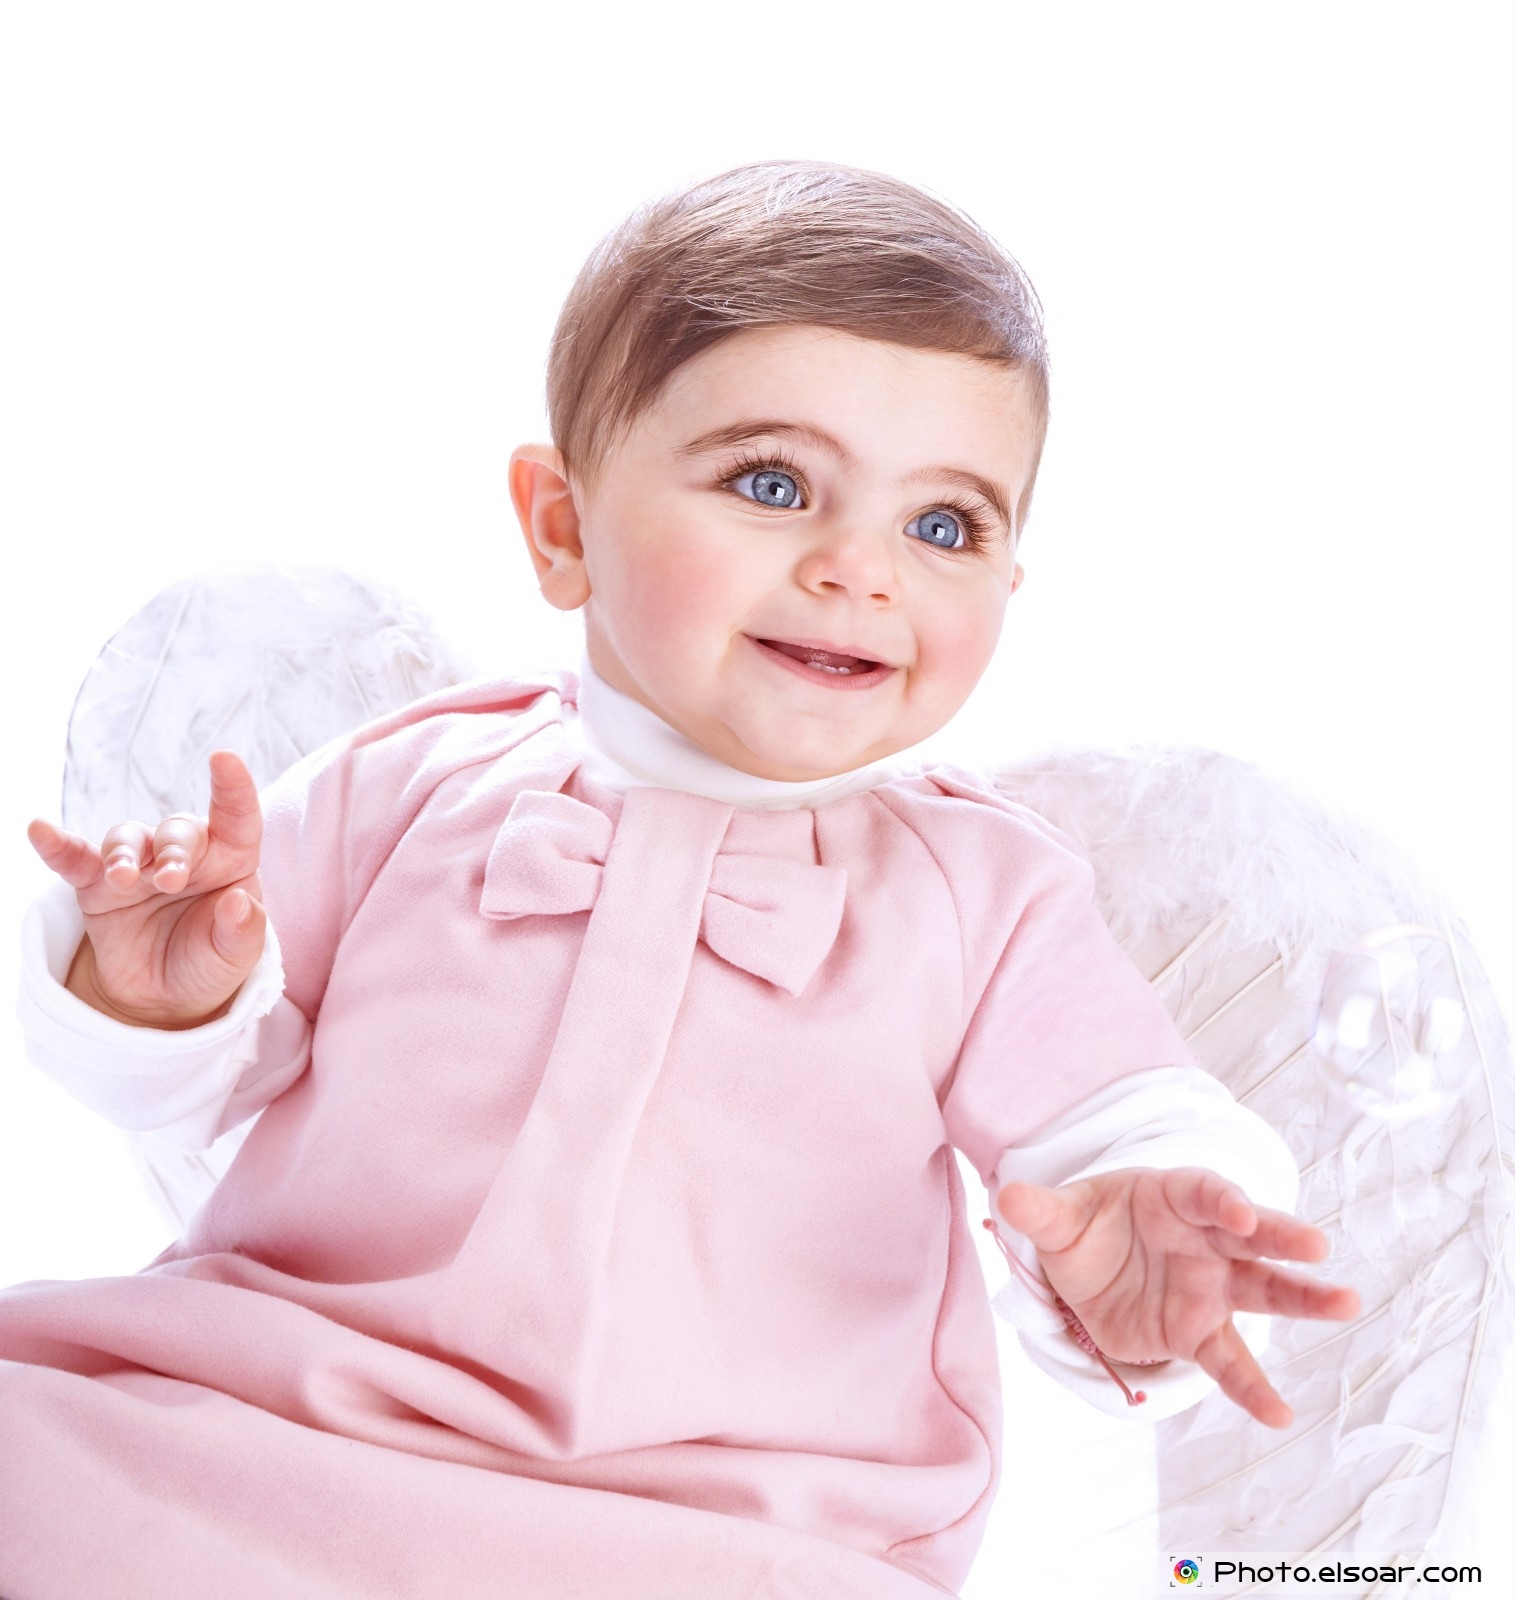 girl cute baby angel - photo #23